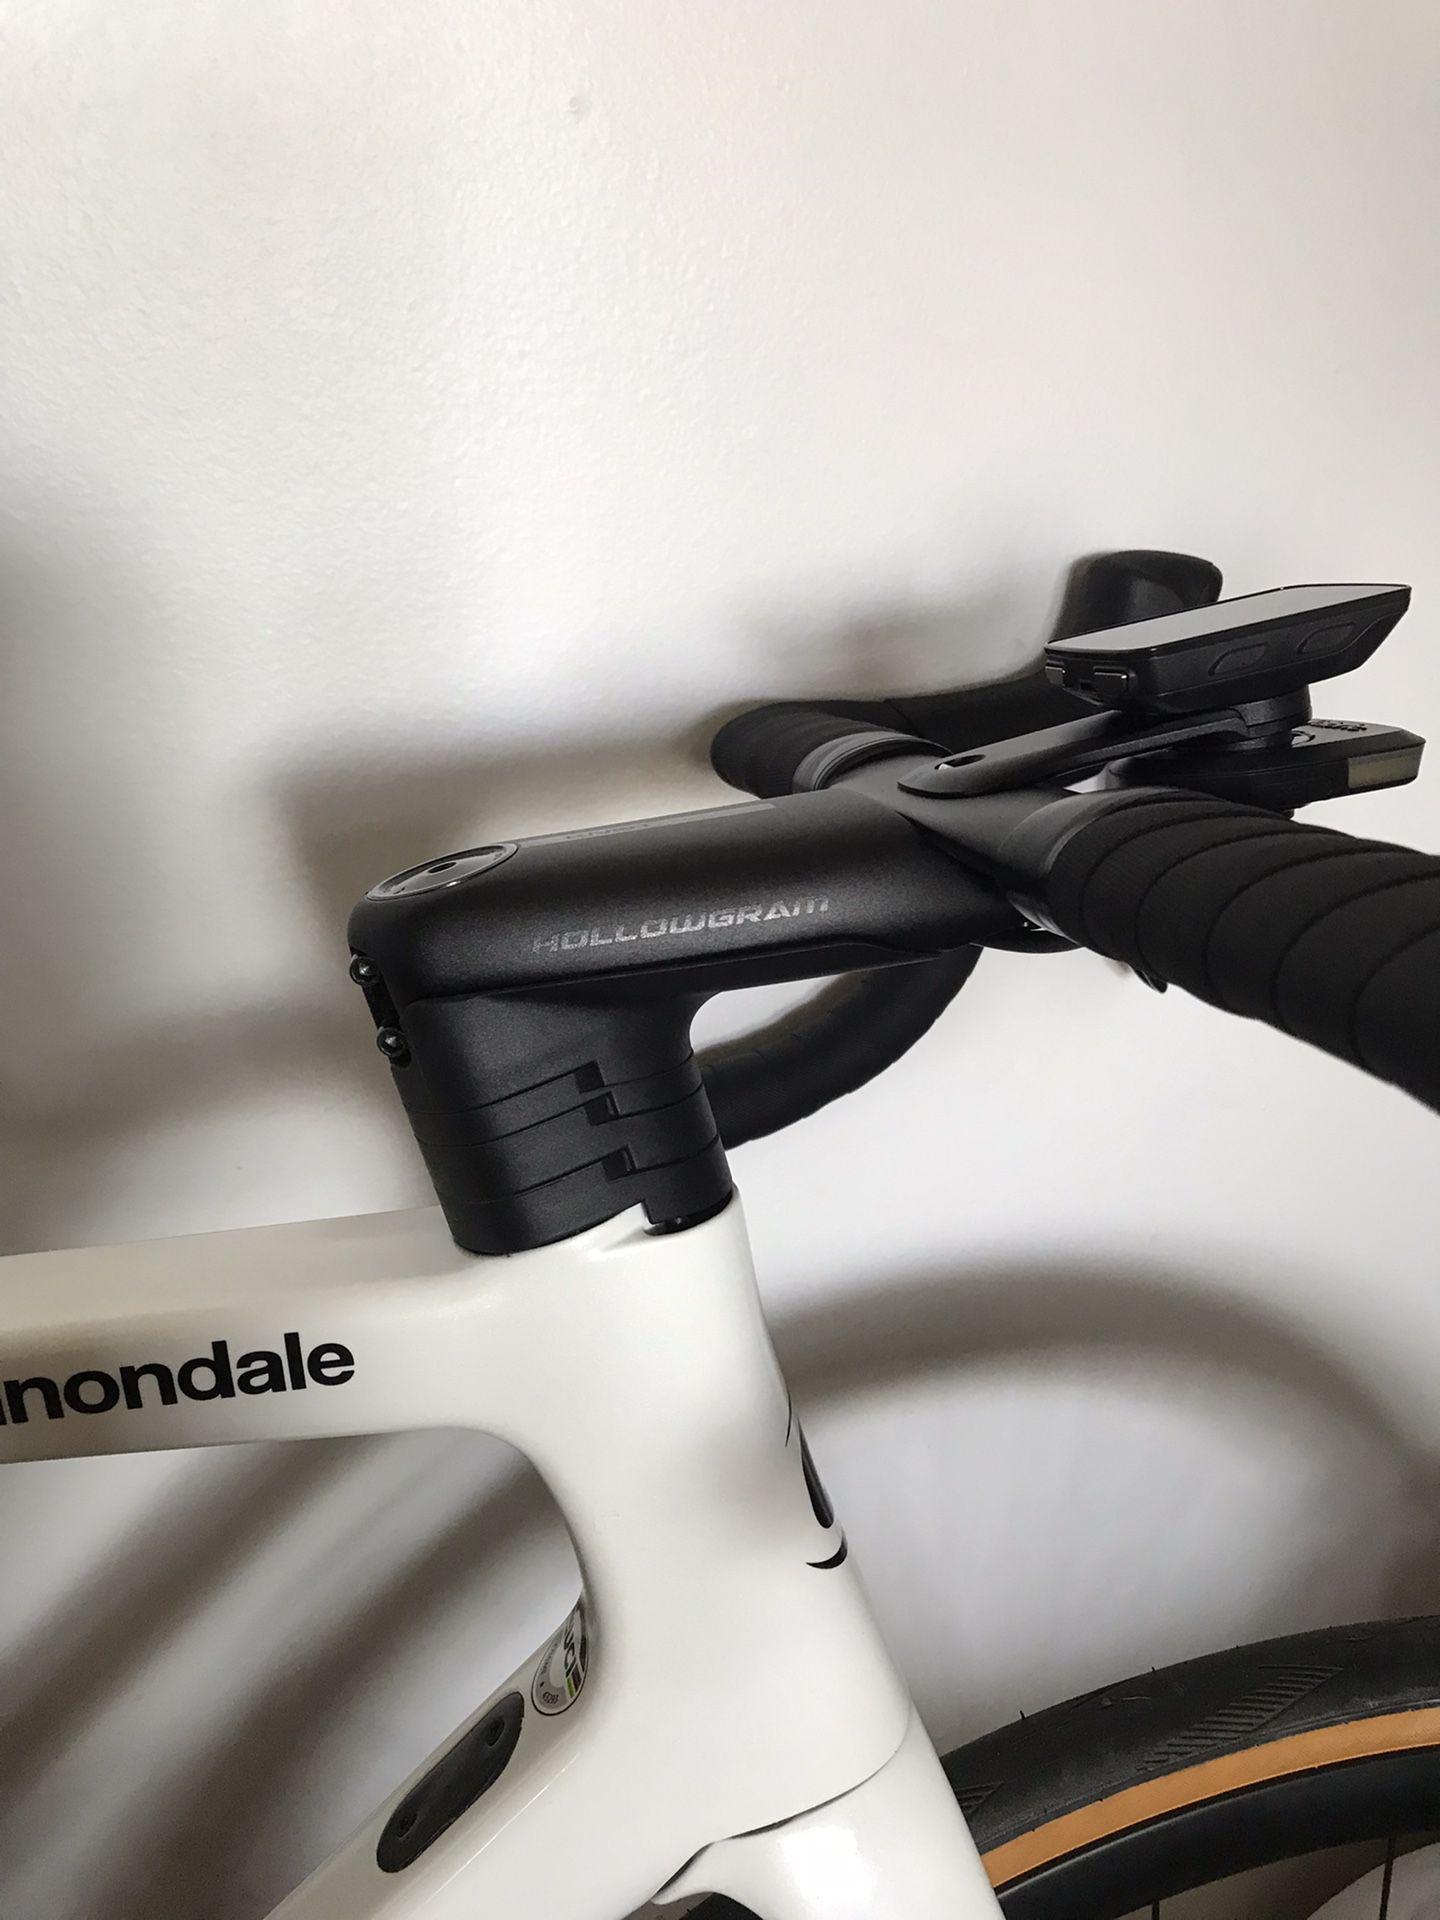 Cannondale Knot Stem 100mm